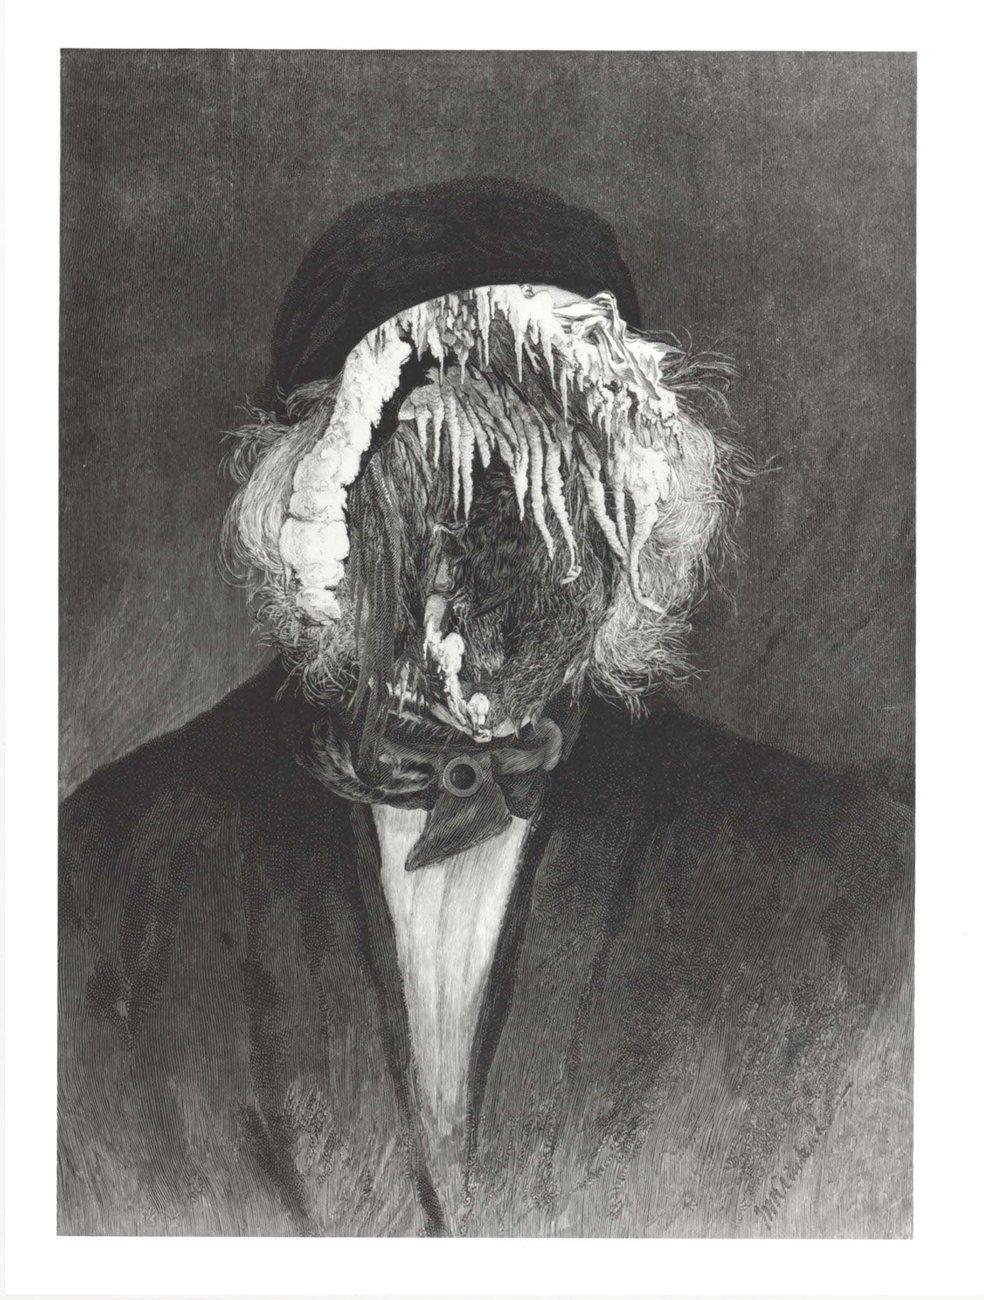 Artwork image, Bruce Conner, The Artist